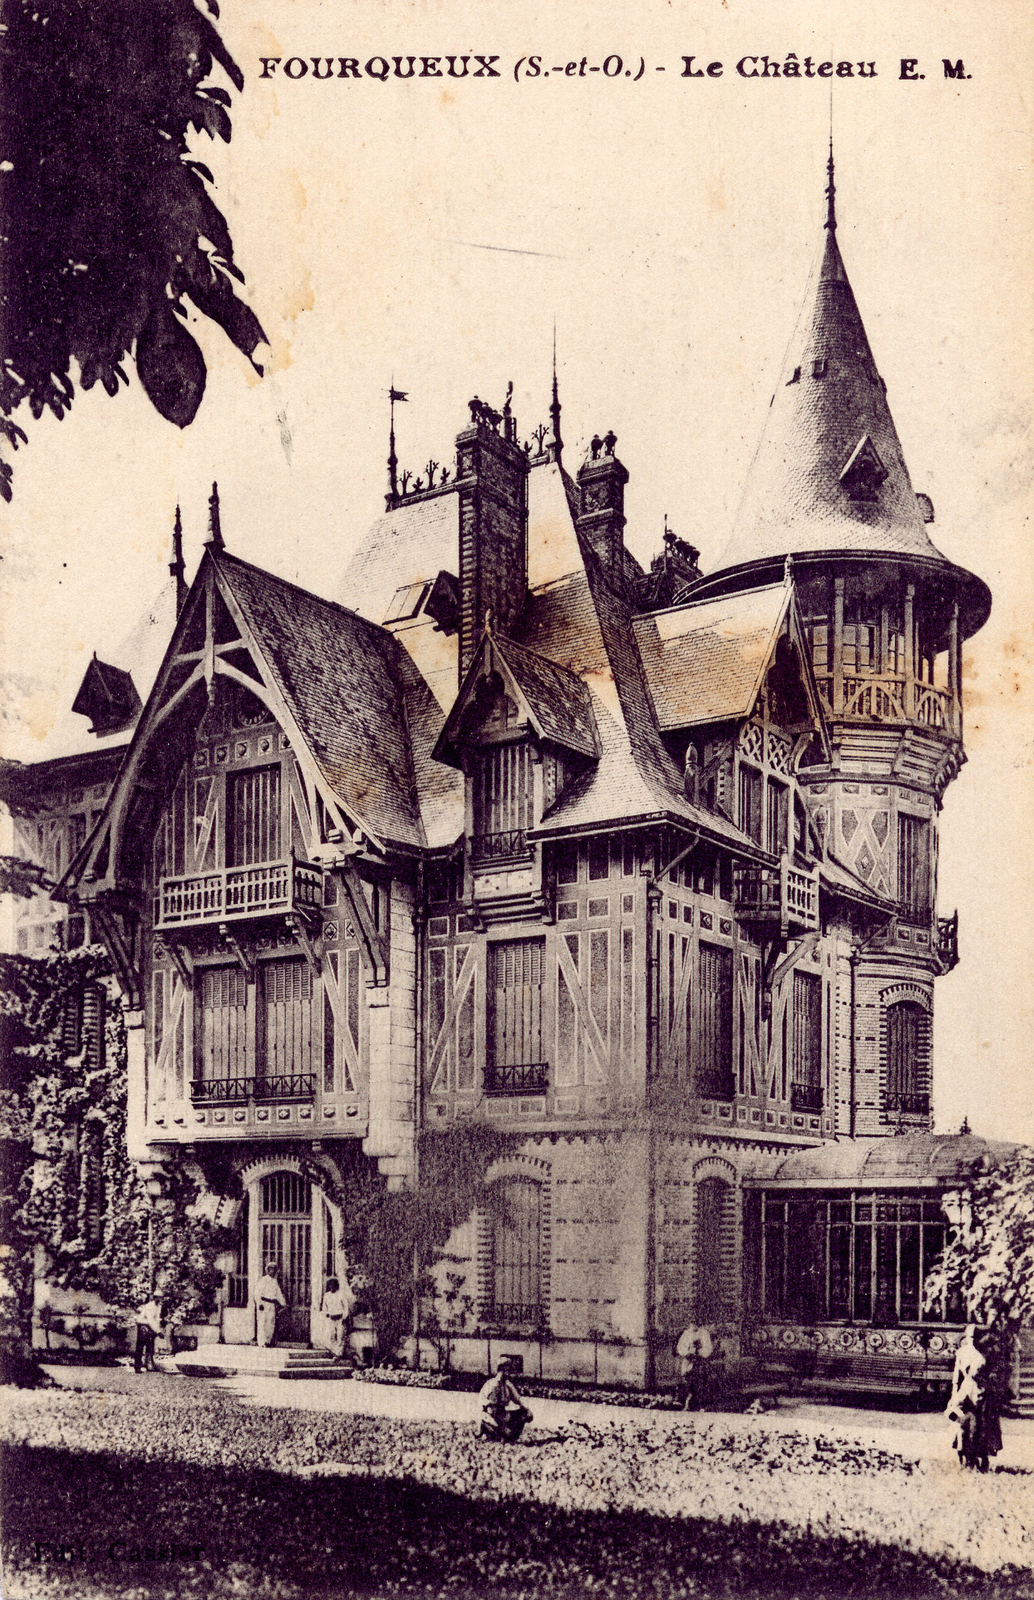 Ancienne carte postale de la Villa Colin